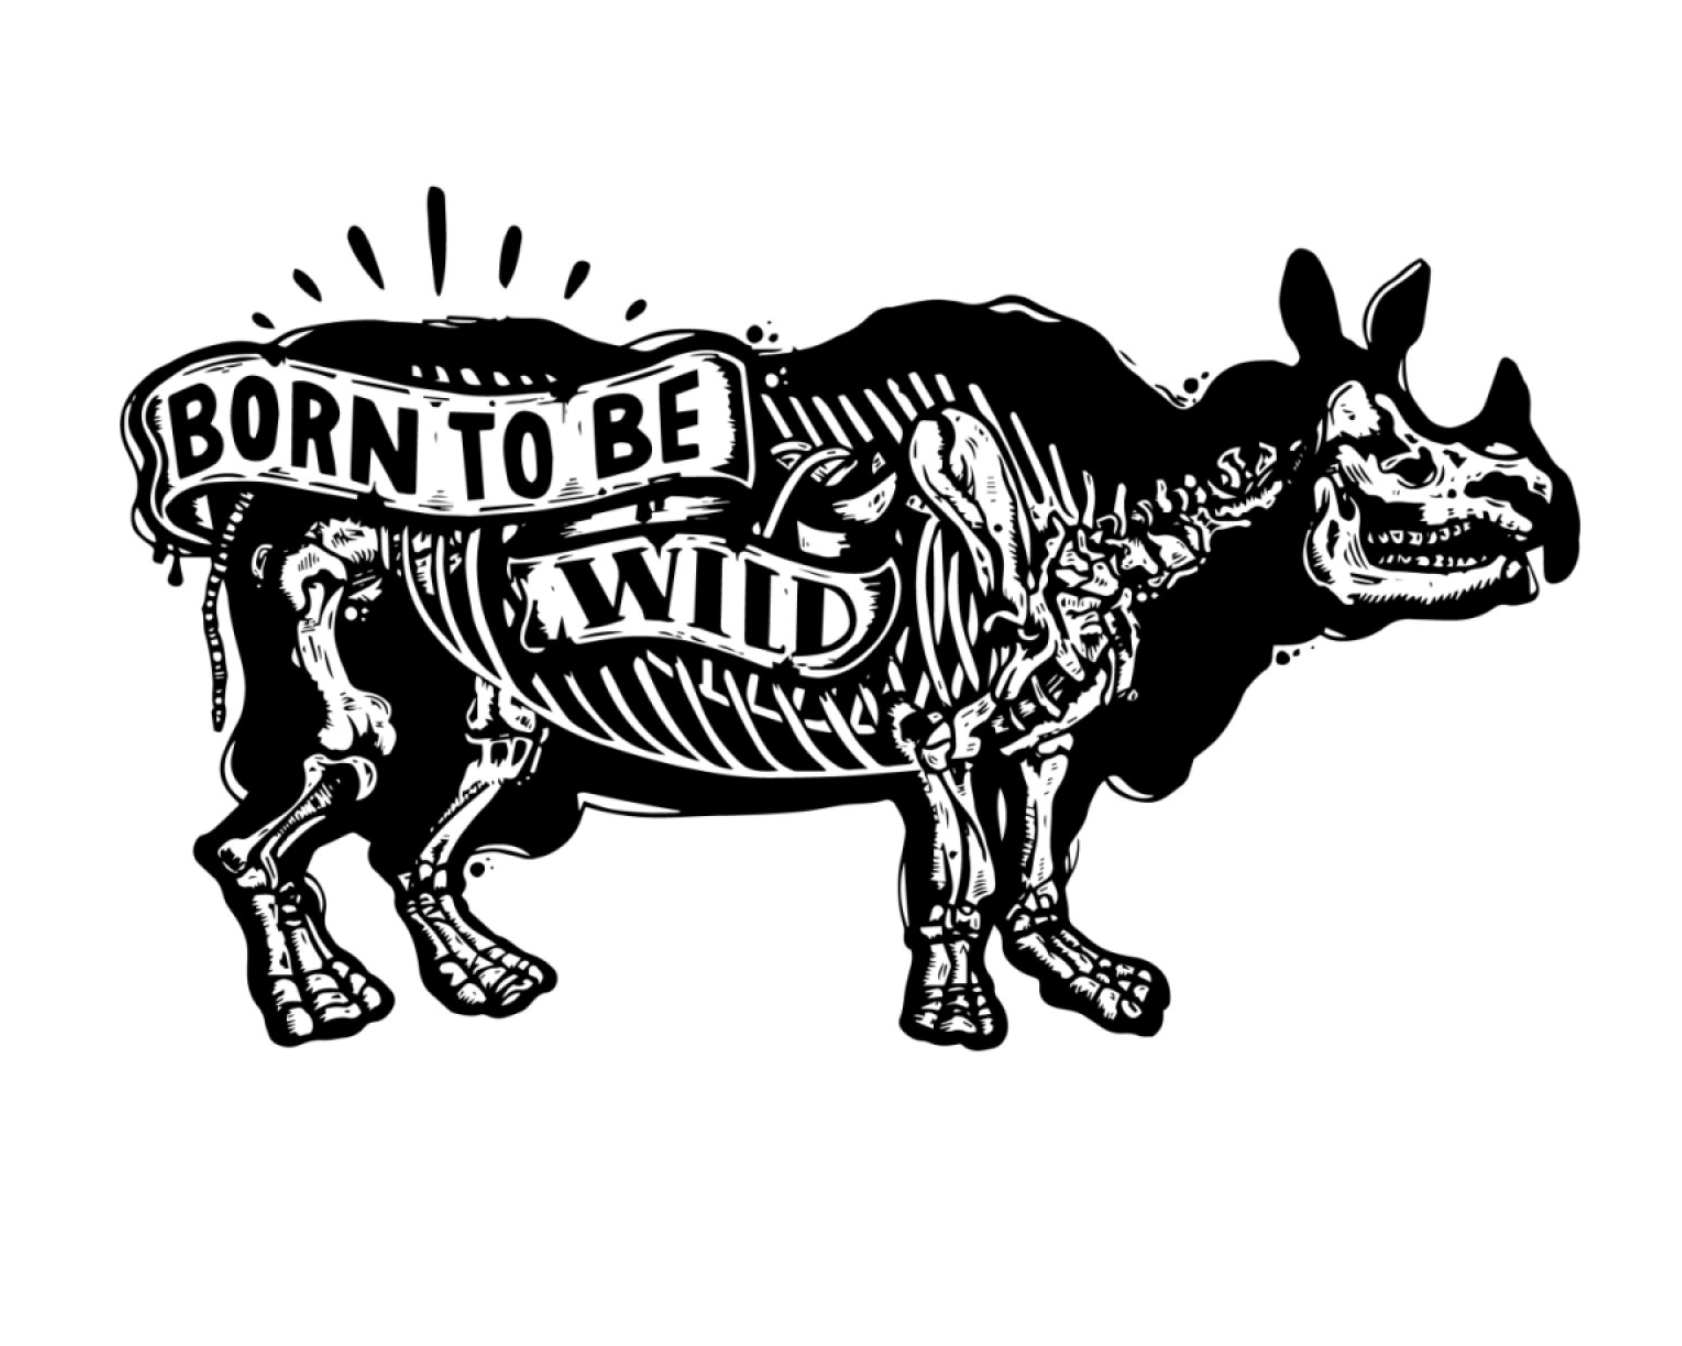 Juanita Garcia tattoo style - born to be wild